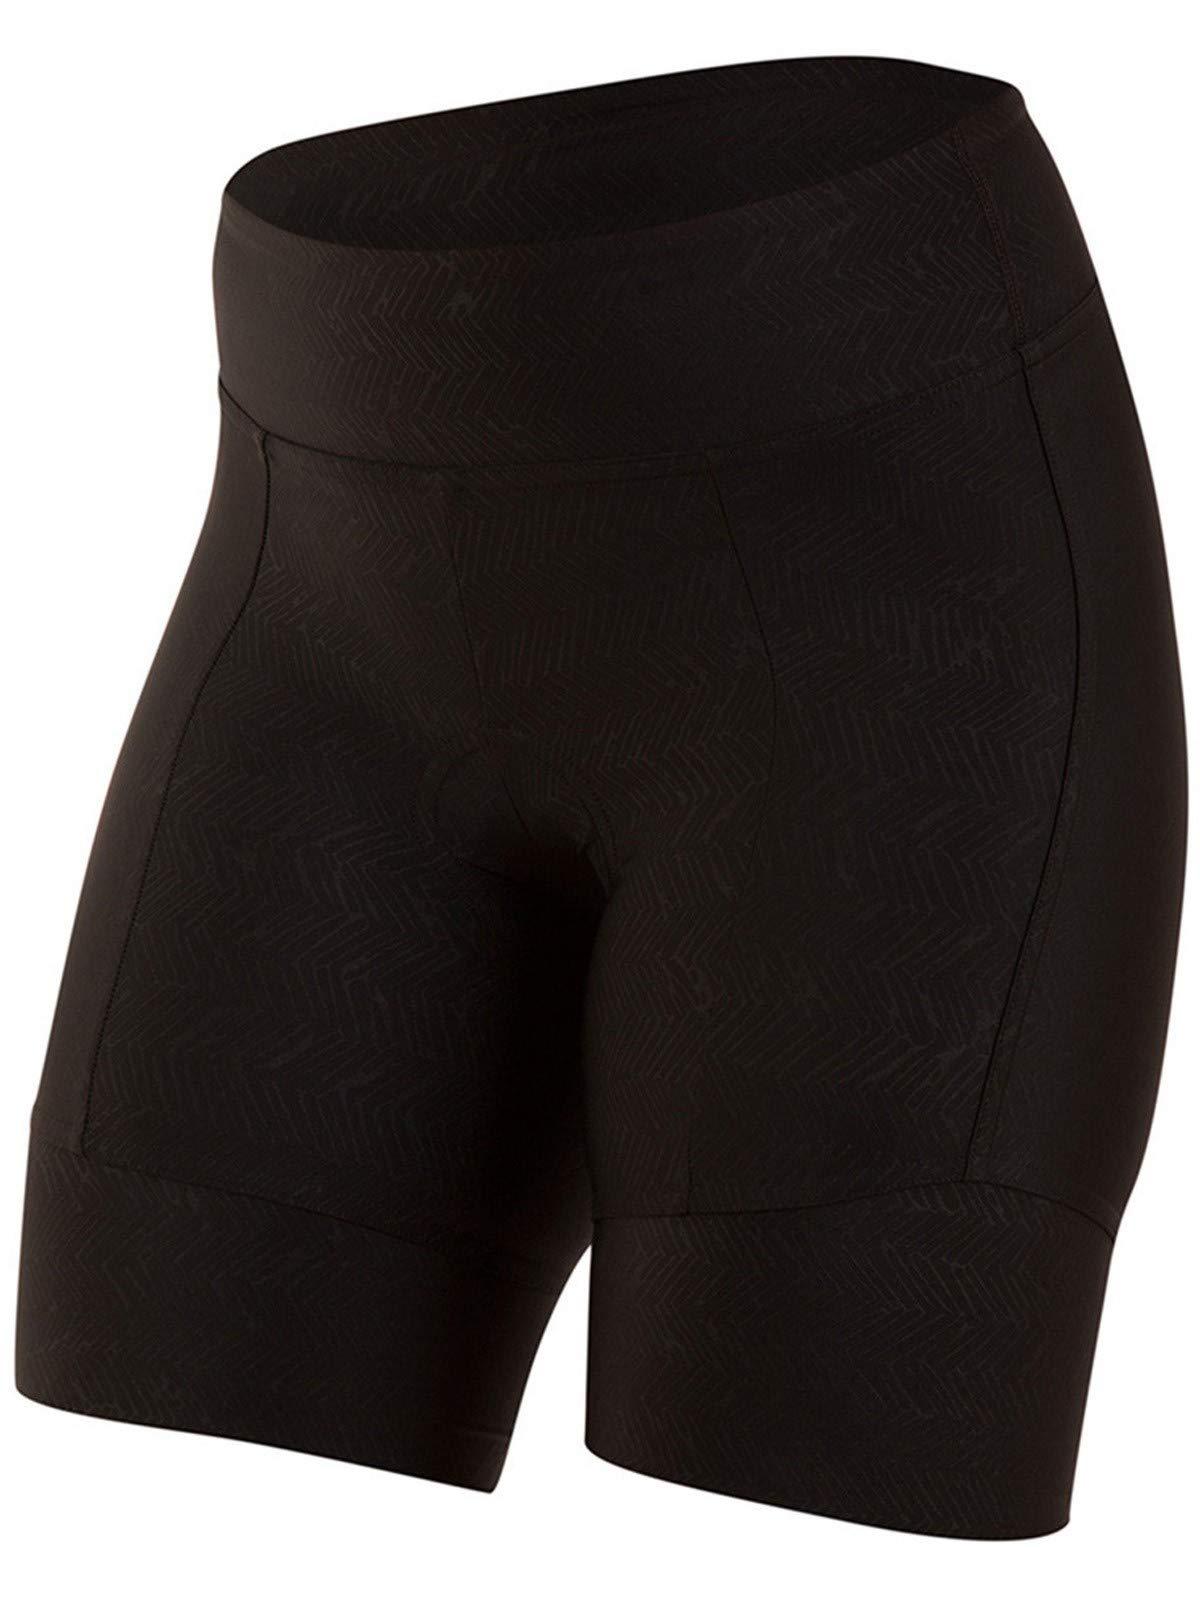 Pearl iZUMi Women's Pursuit Attack Shorts, Black Texture, XX-Large